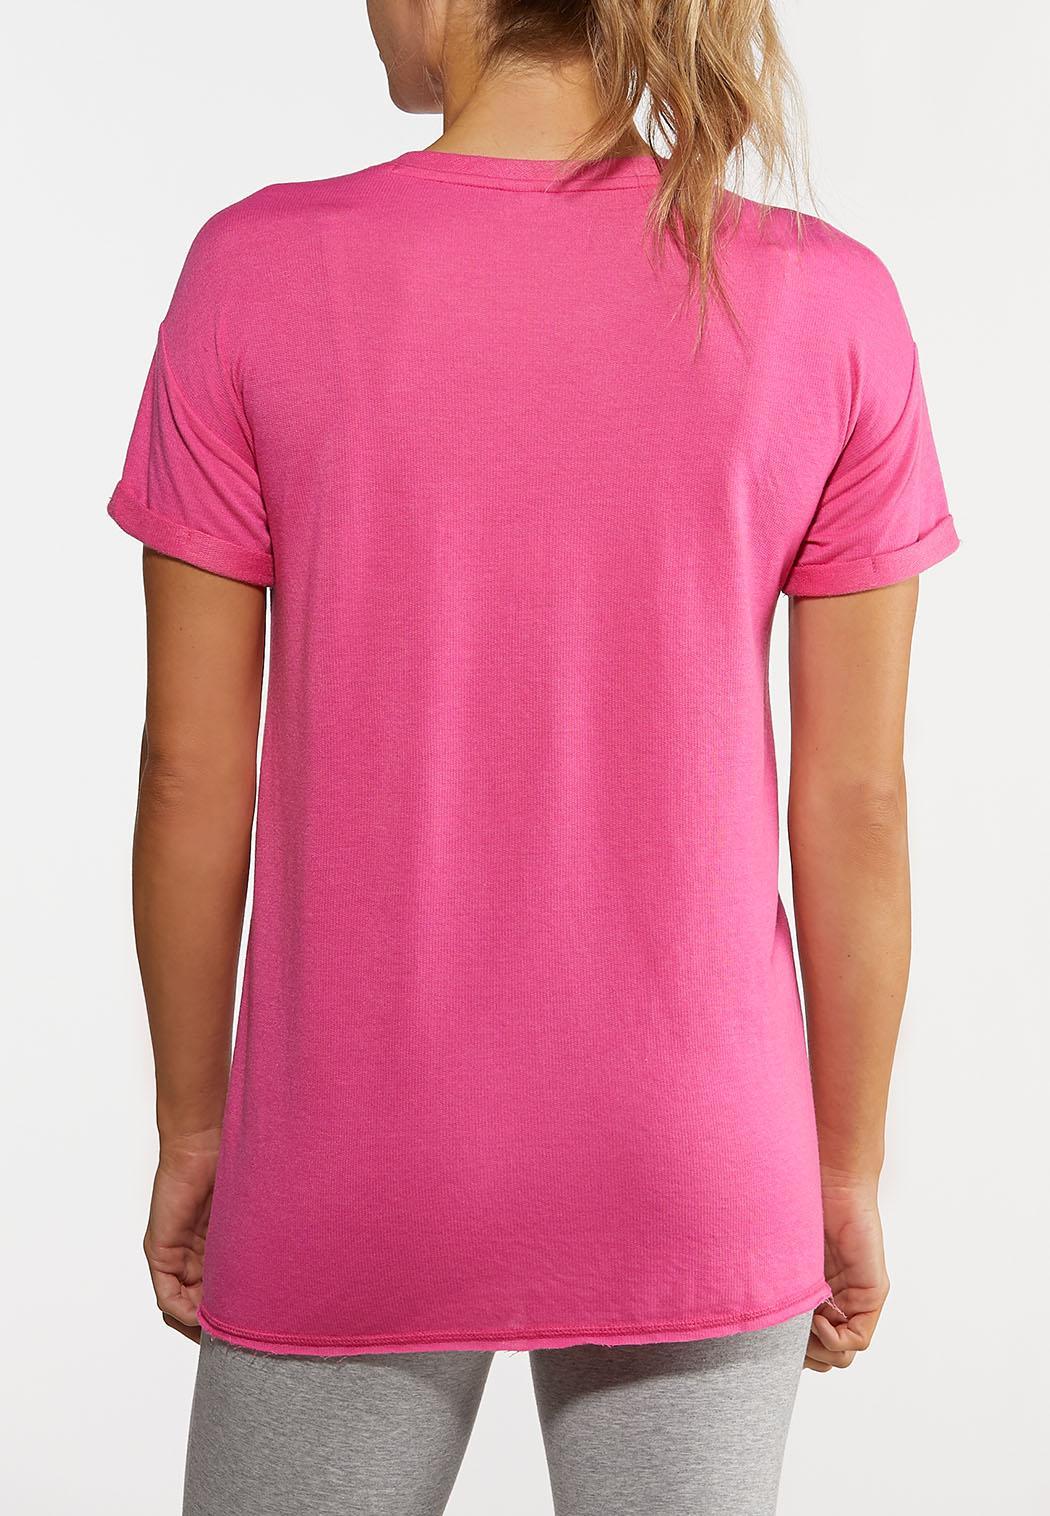 Plus Size Tie Front Active Top (Item #44168530)